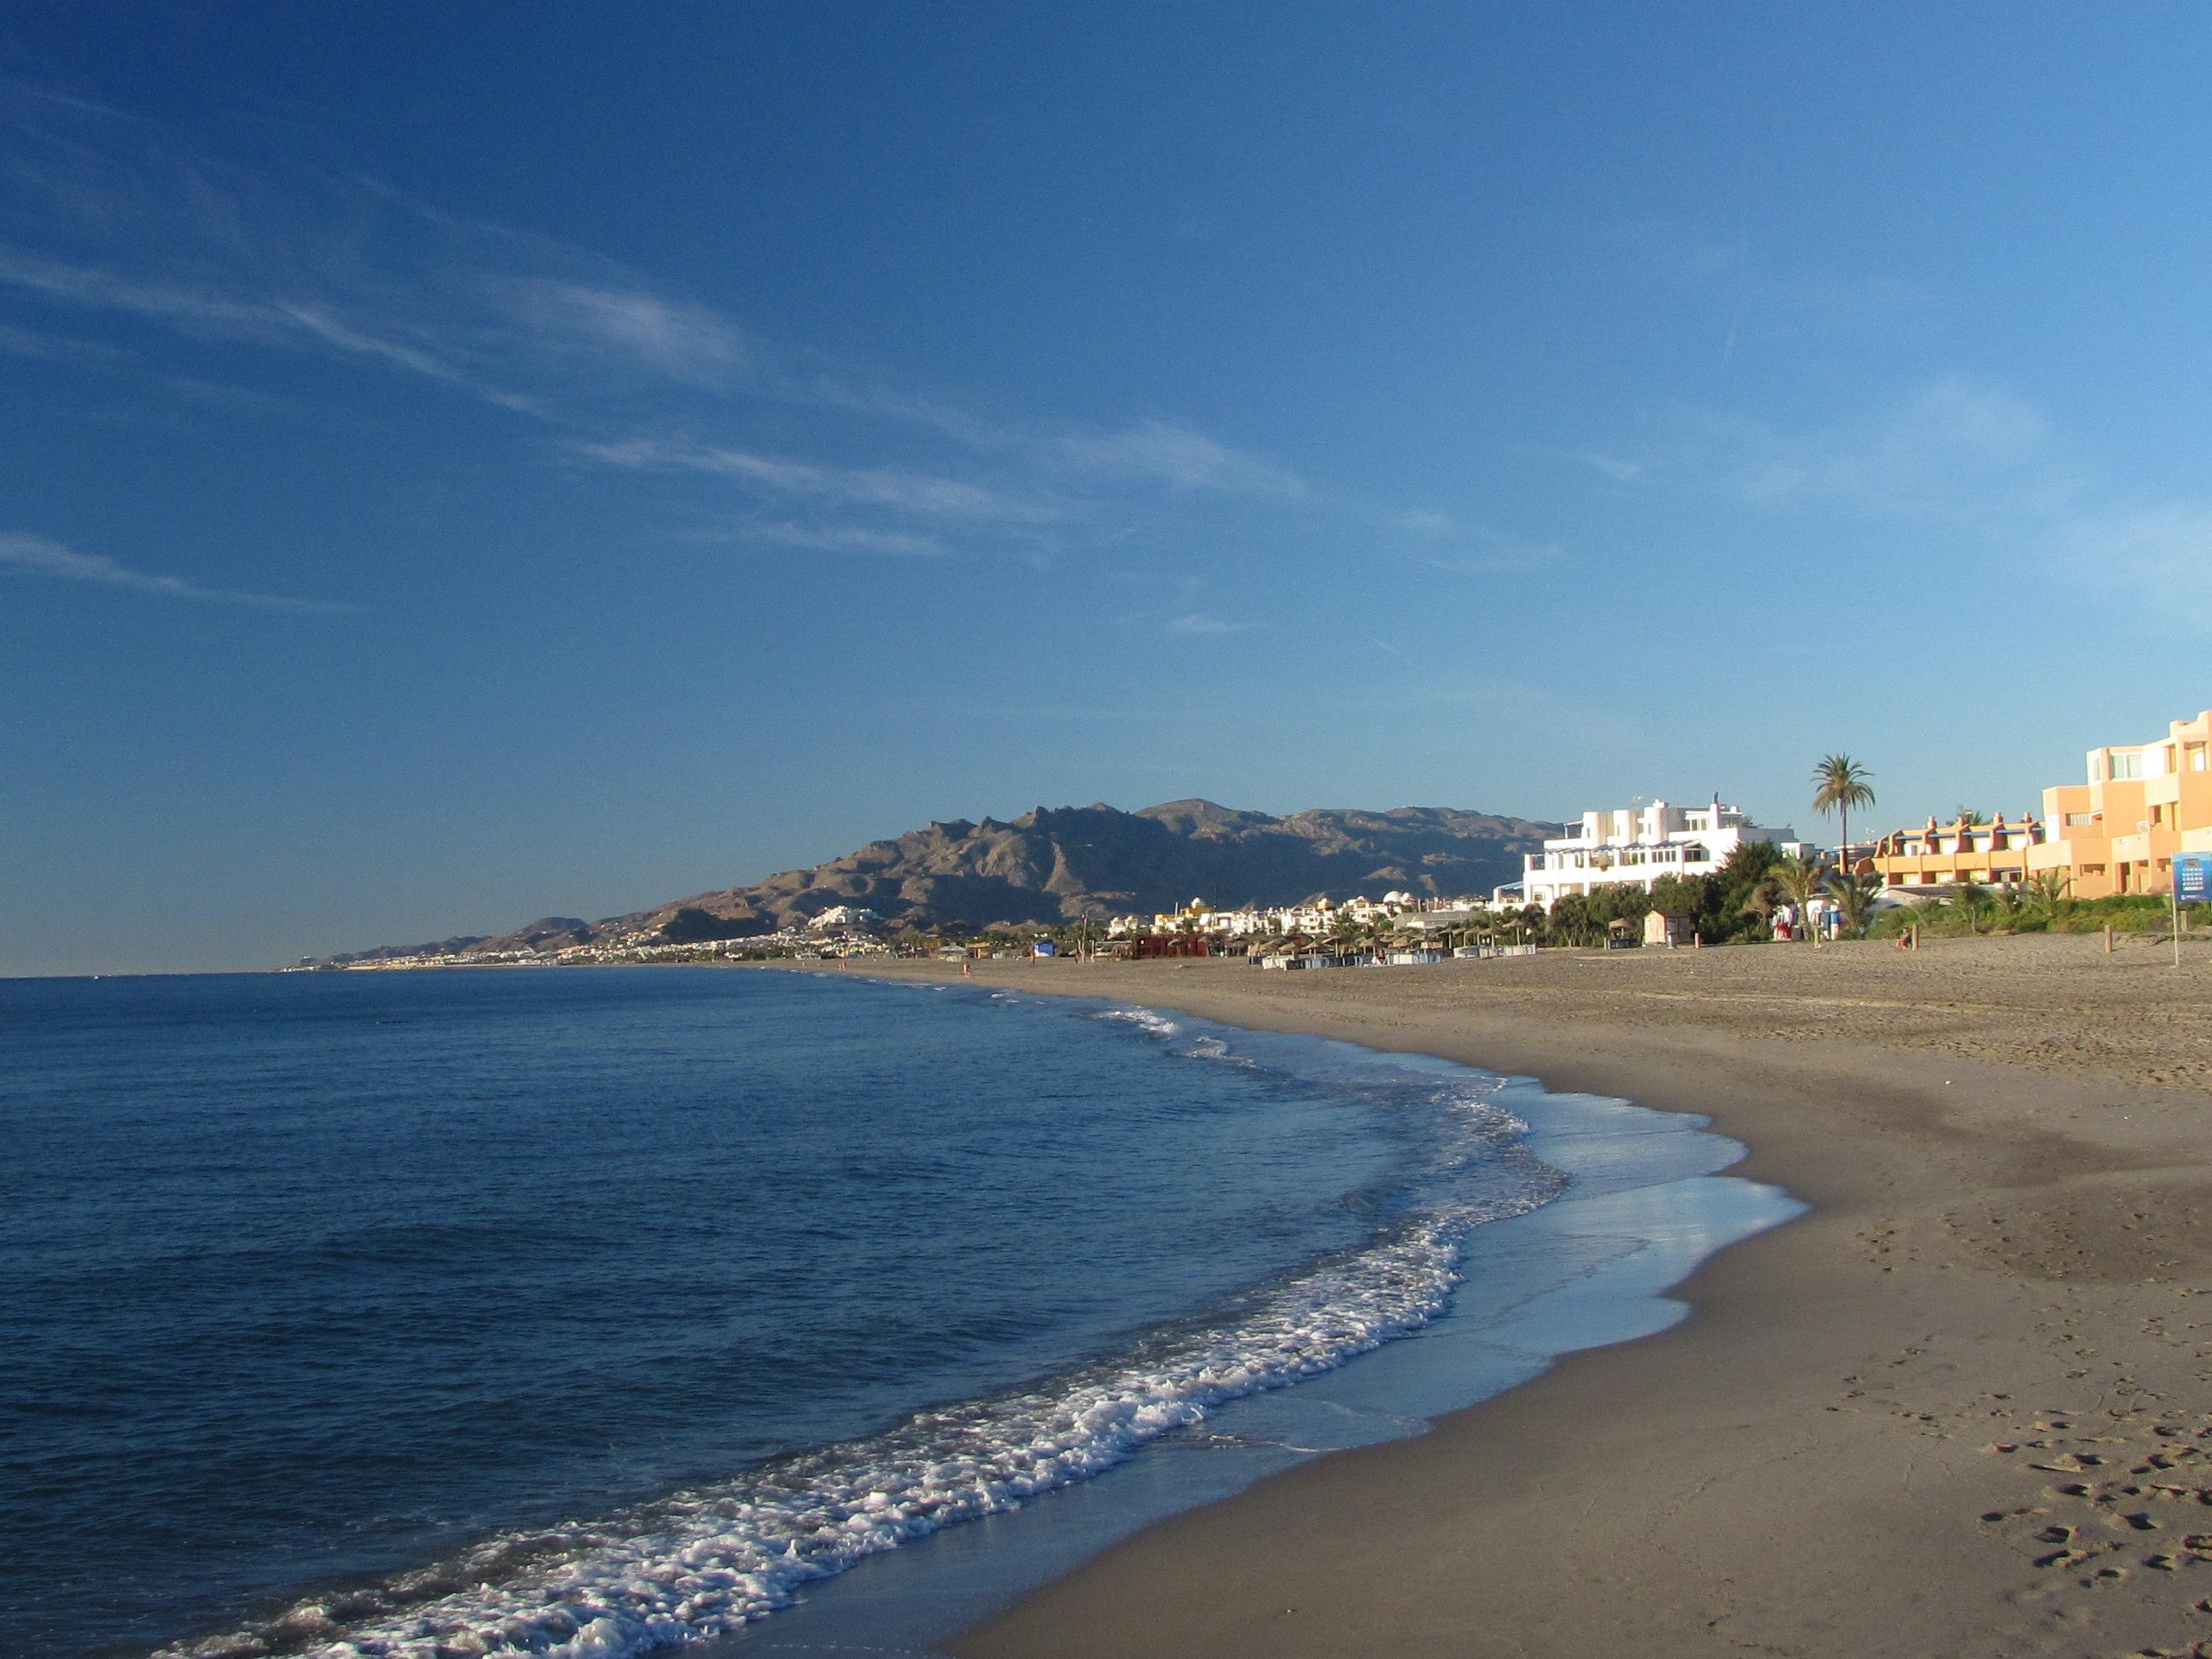 Marinas De Nerja Beach And Spa Hotel